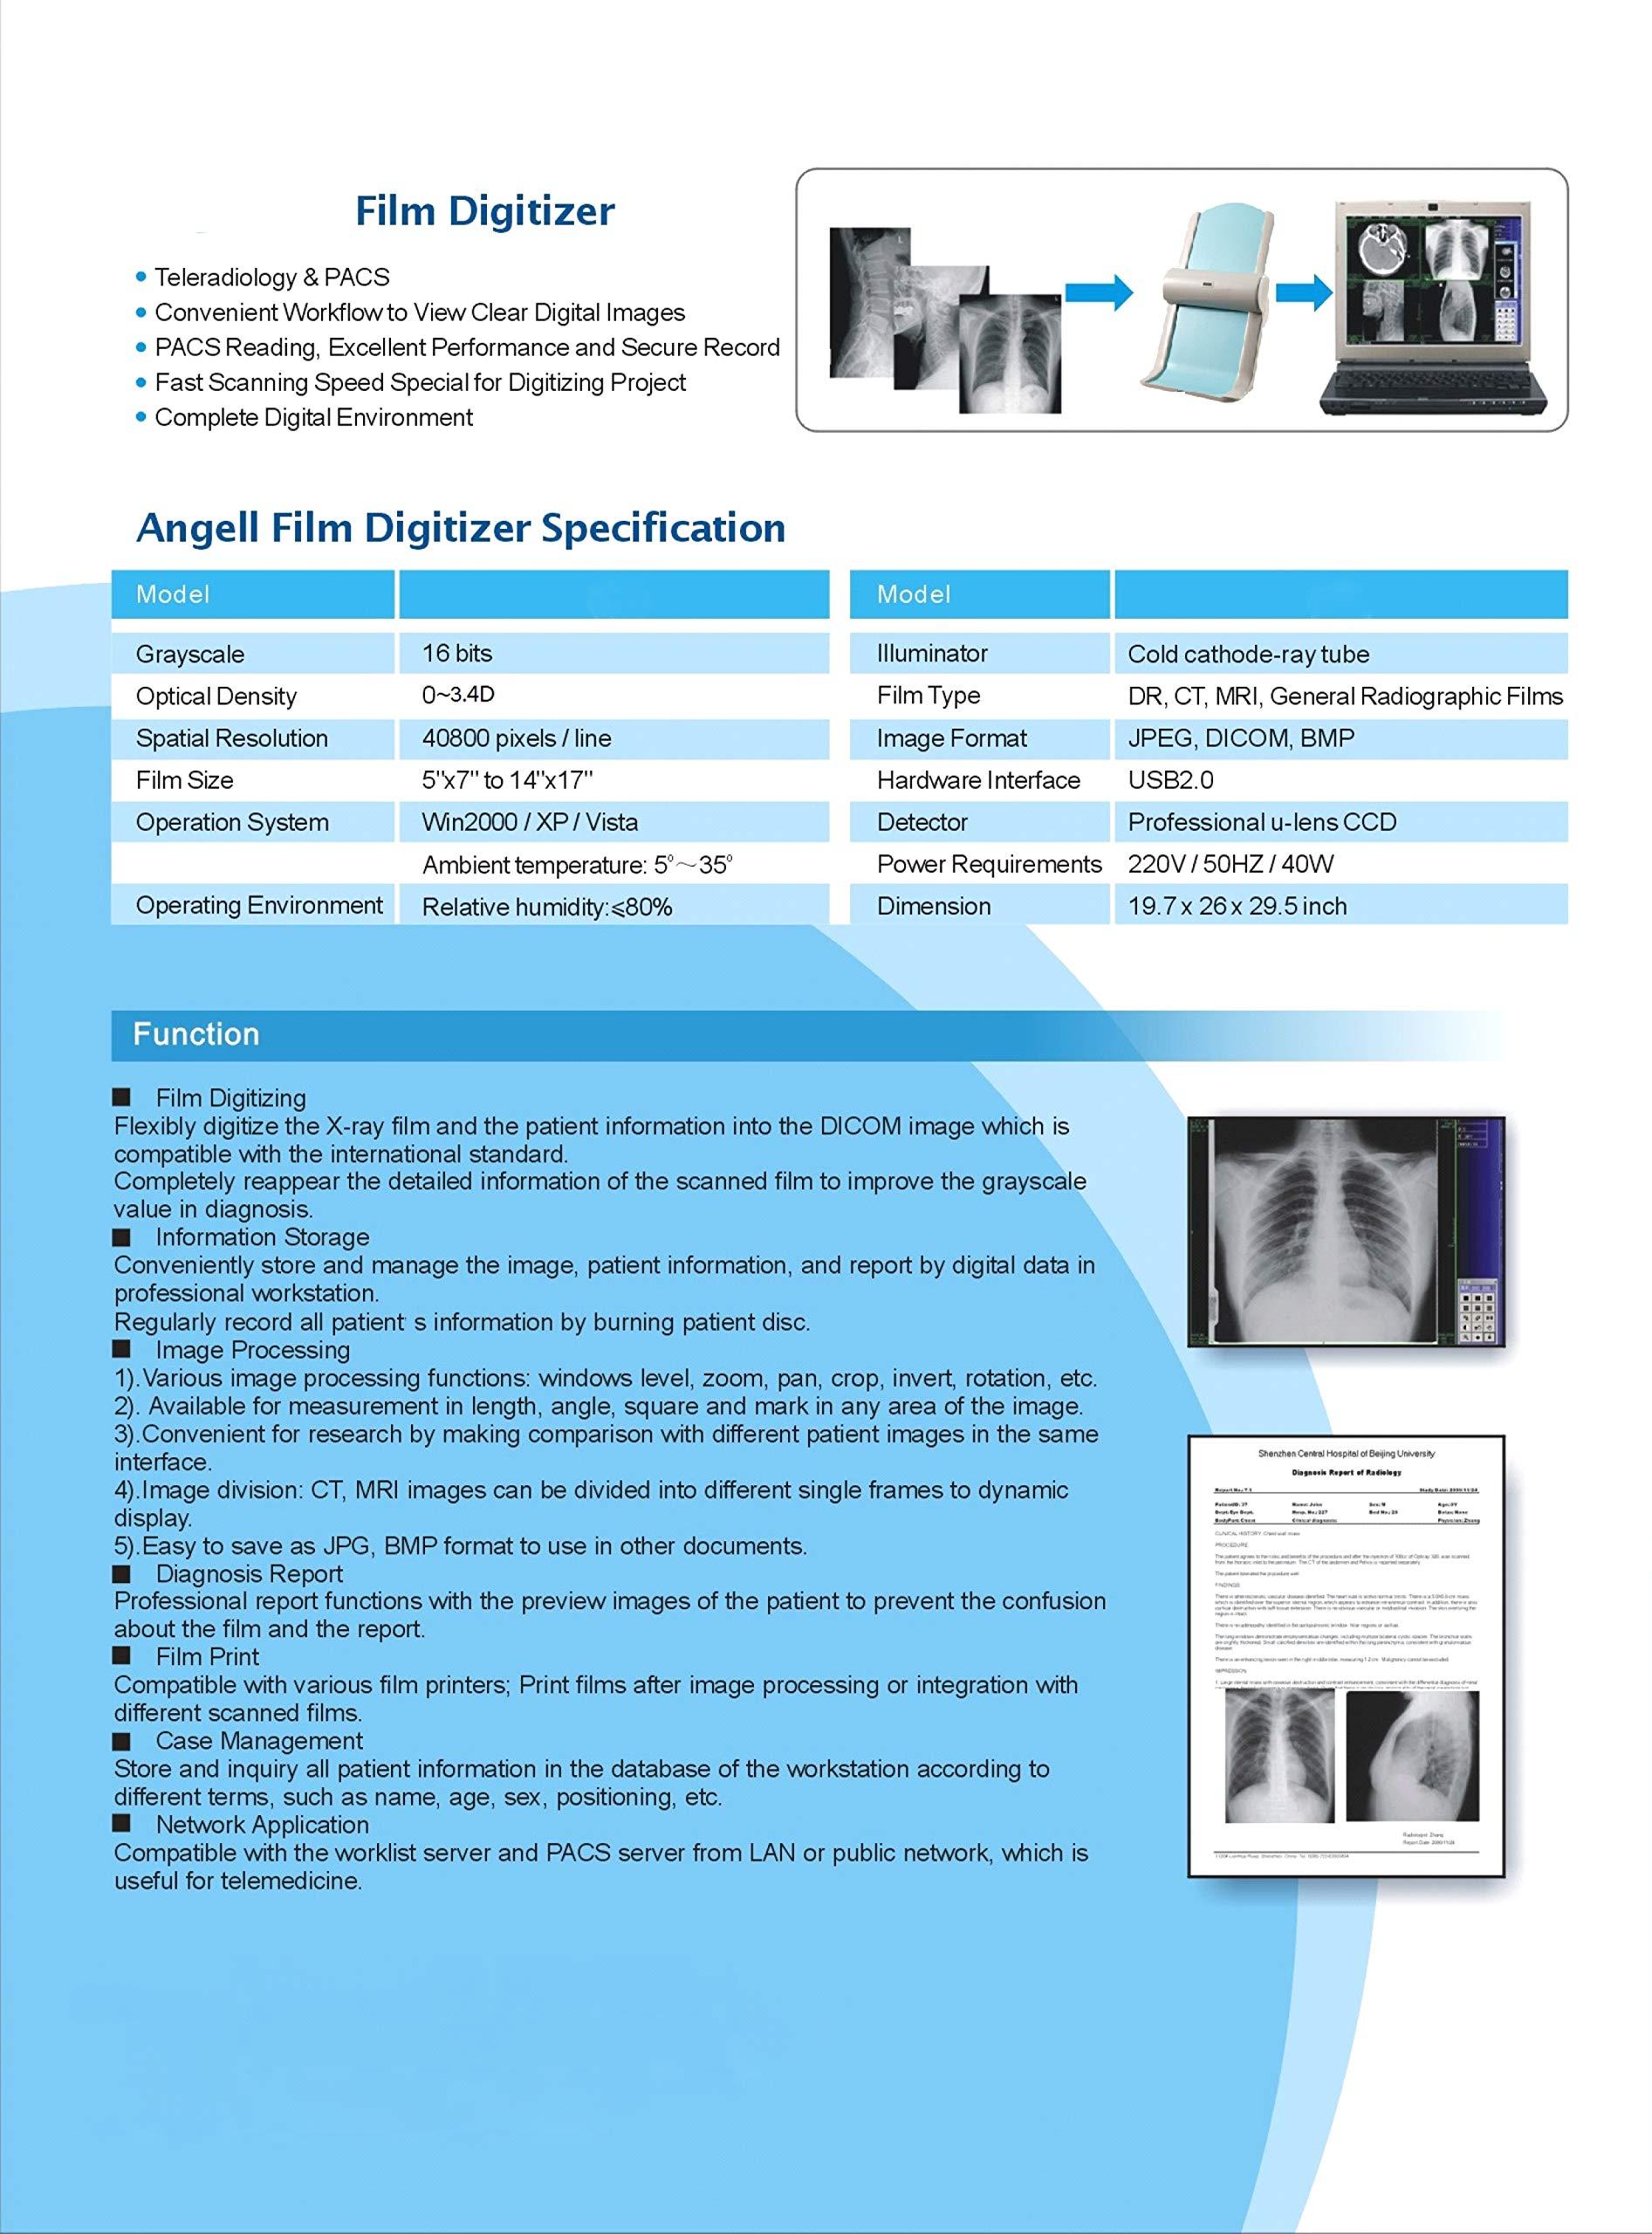 X-ray Film Digitizer Scanner Wireless Analog-Digital Converter by Angolo